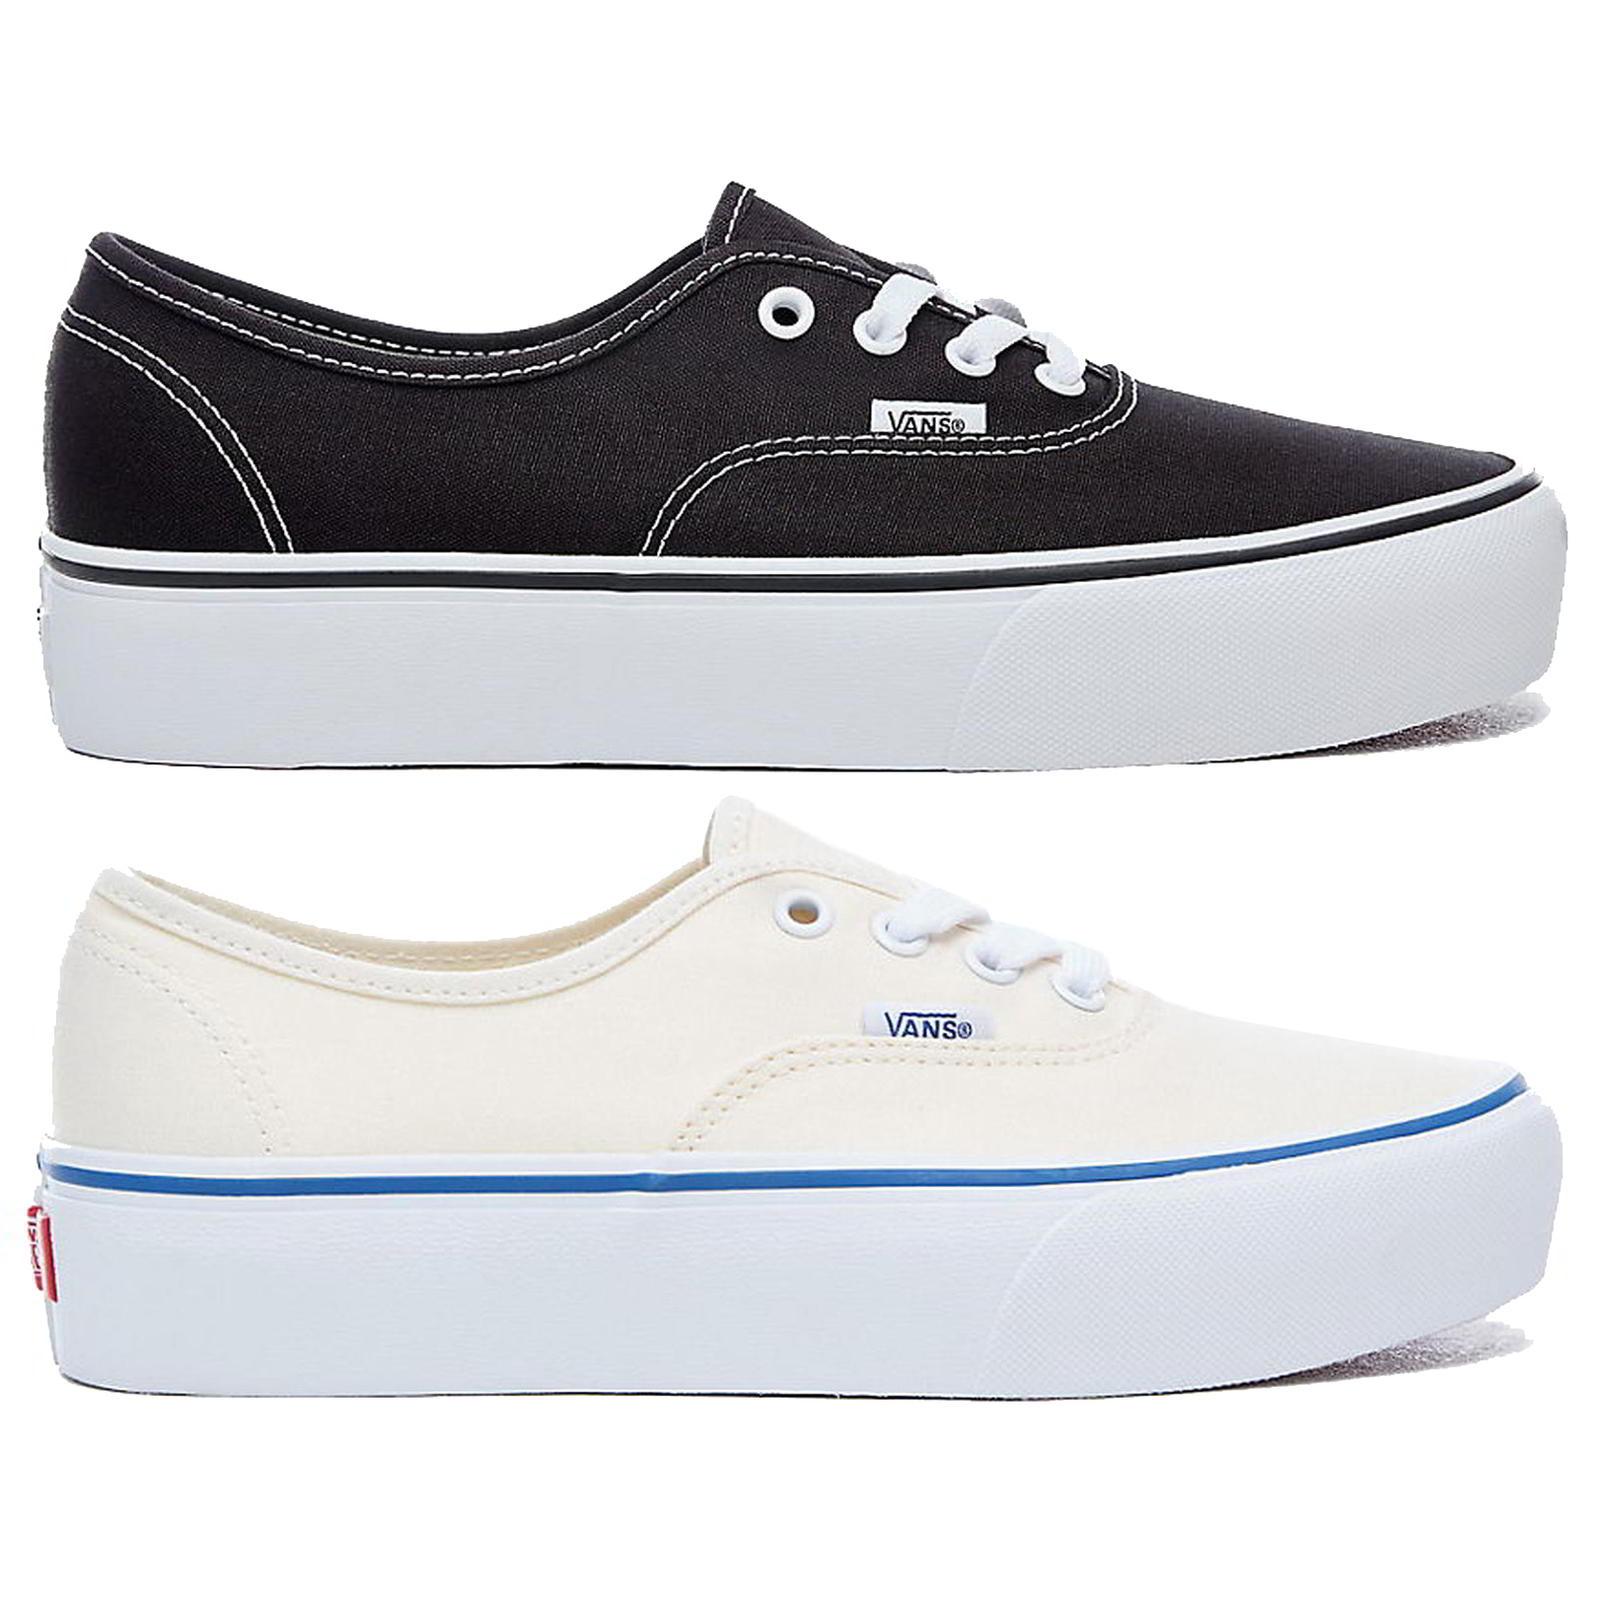 c30e4c5e45ef83 Details about Vans Authentic Platform Womens Black White Lace Up Chunky  Trainers Size 4-8